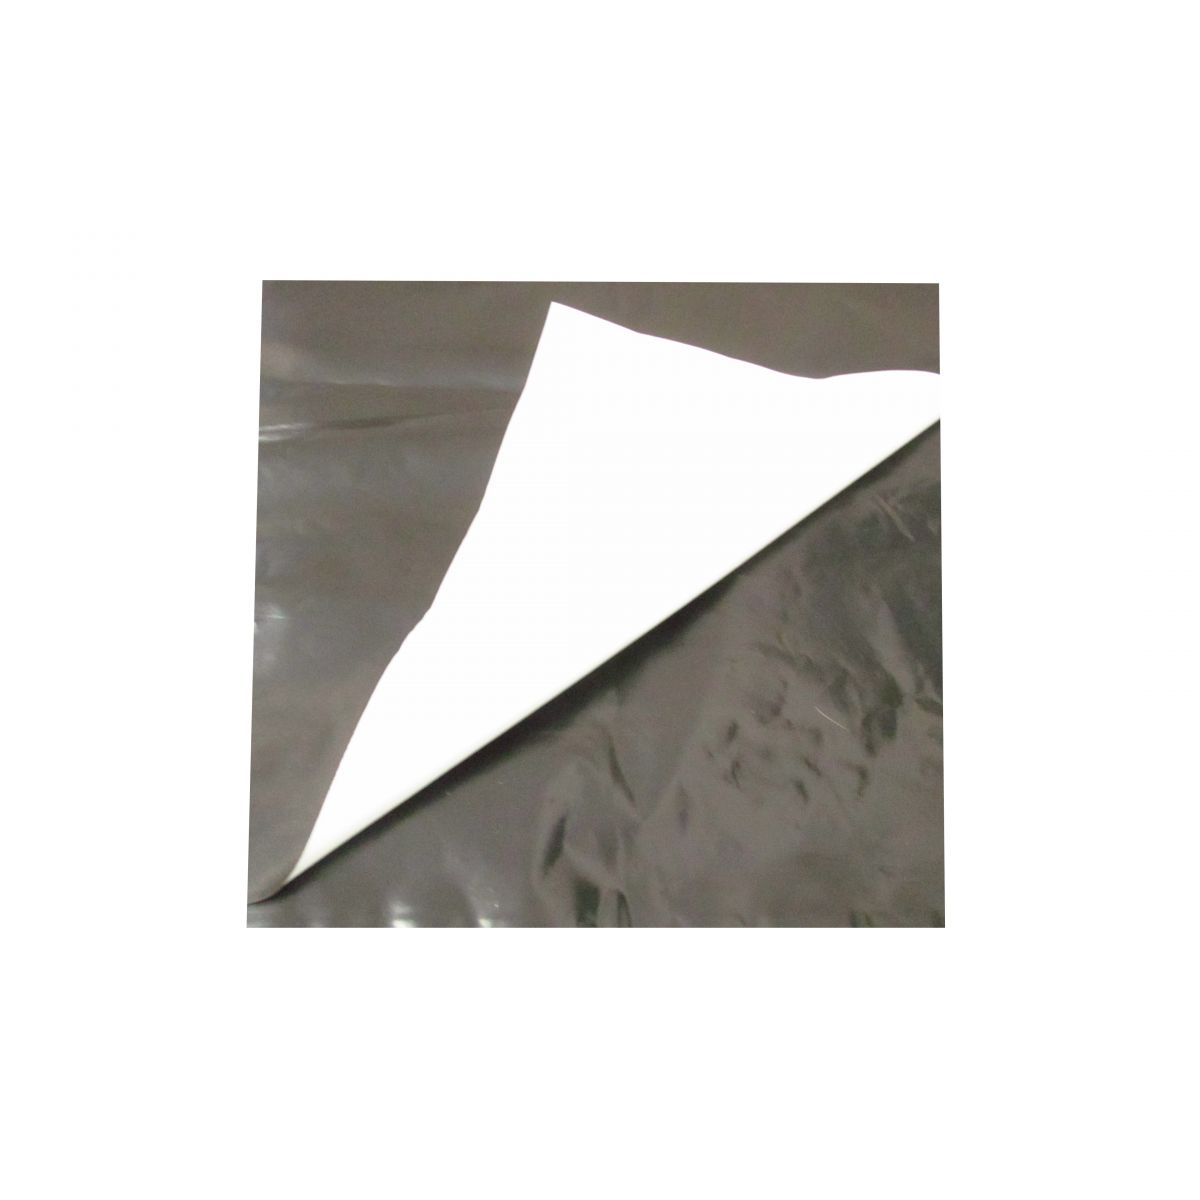 Lona Plastica Preta e Branca 20m x 8m 150 Micras  - Casafaz